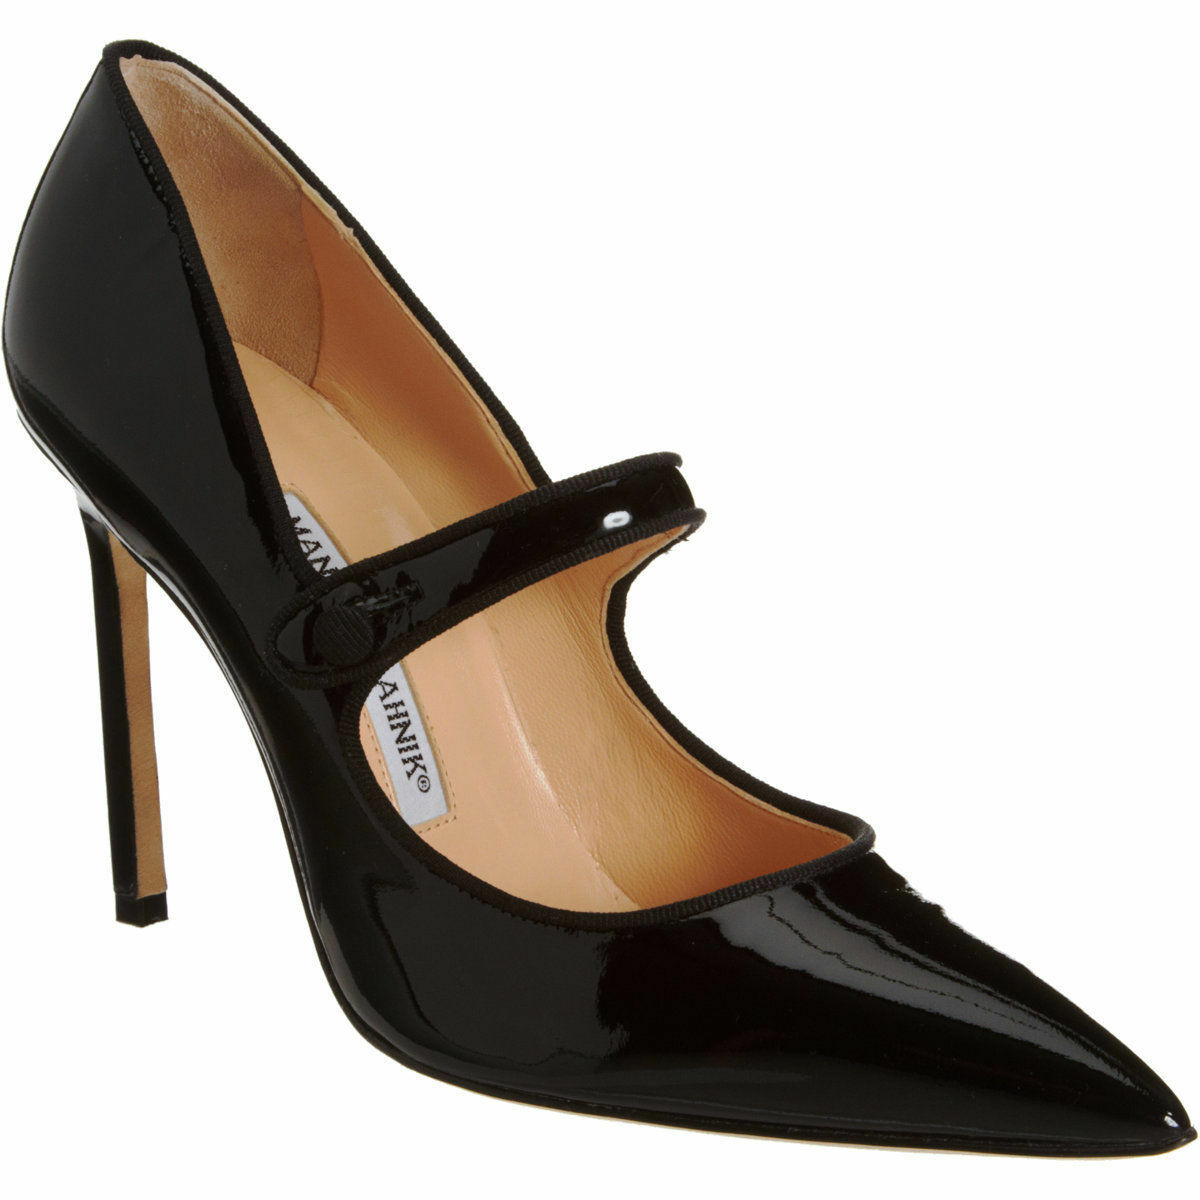 manolo blahnik most expensive shoes